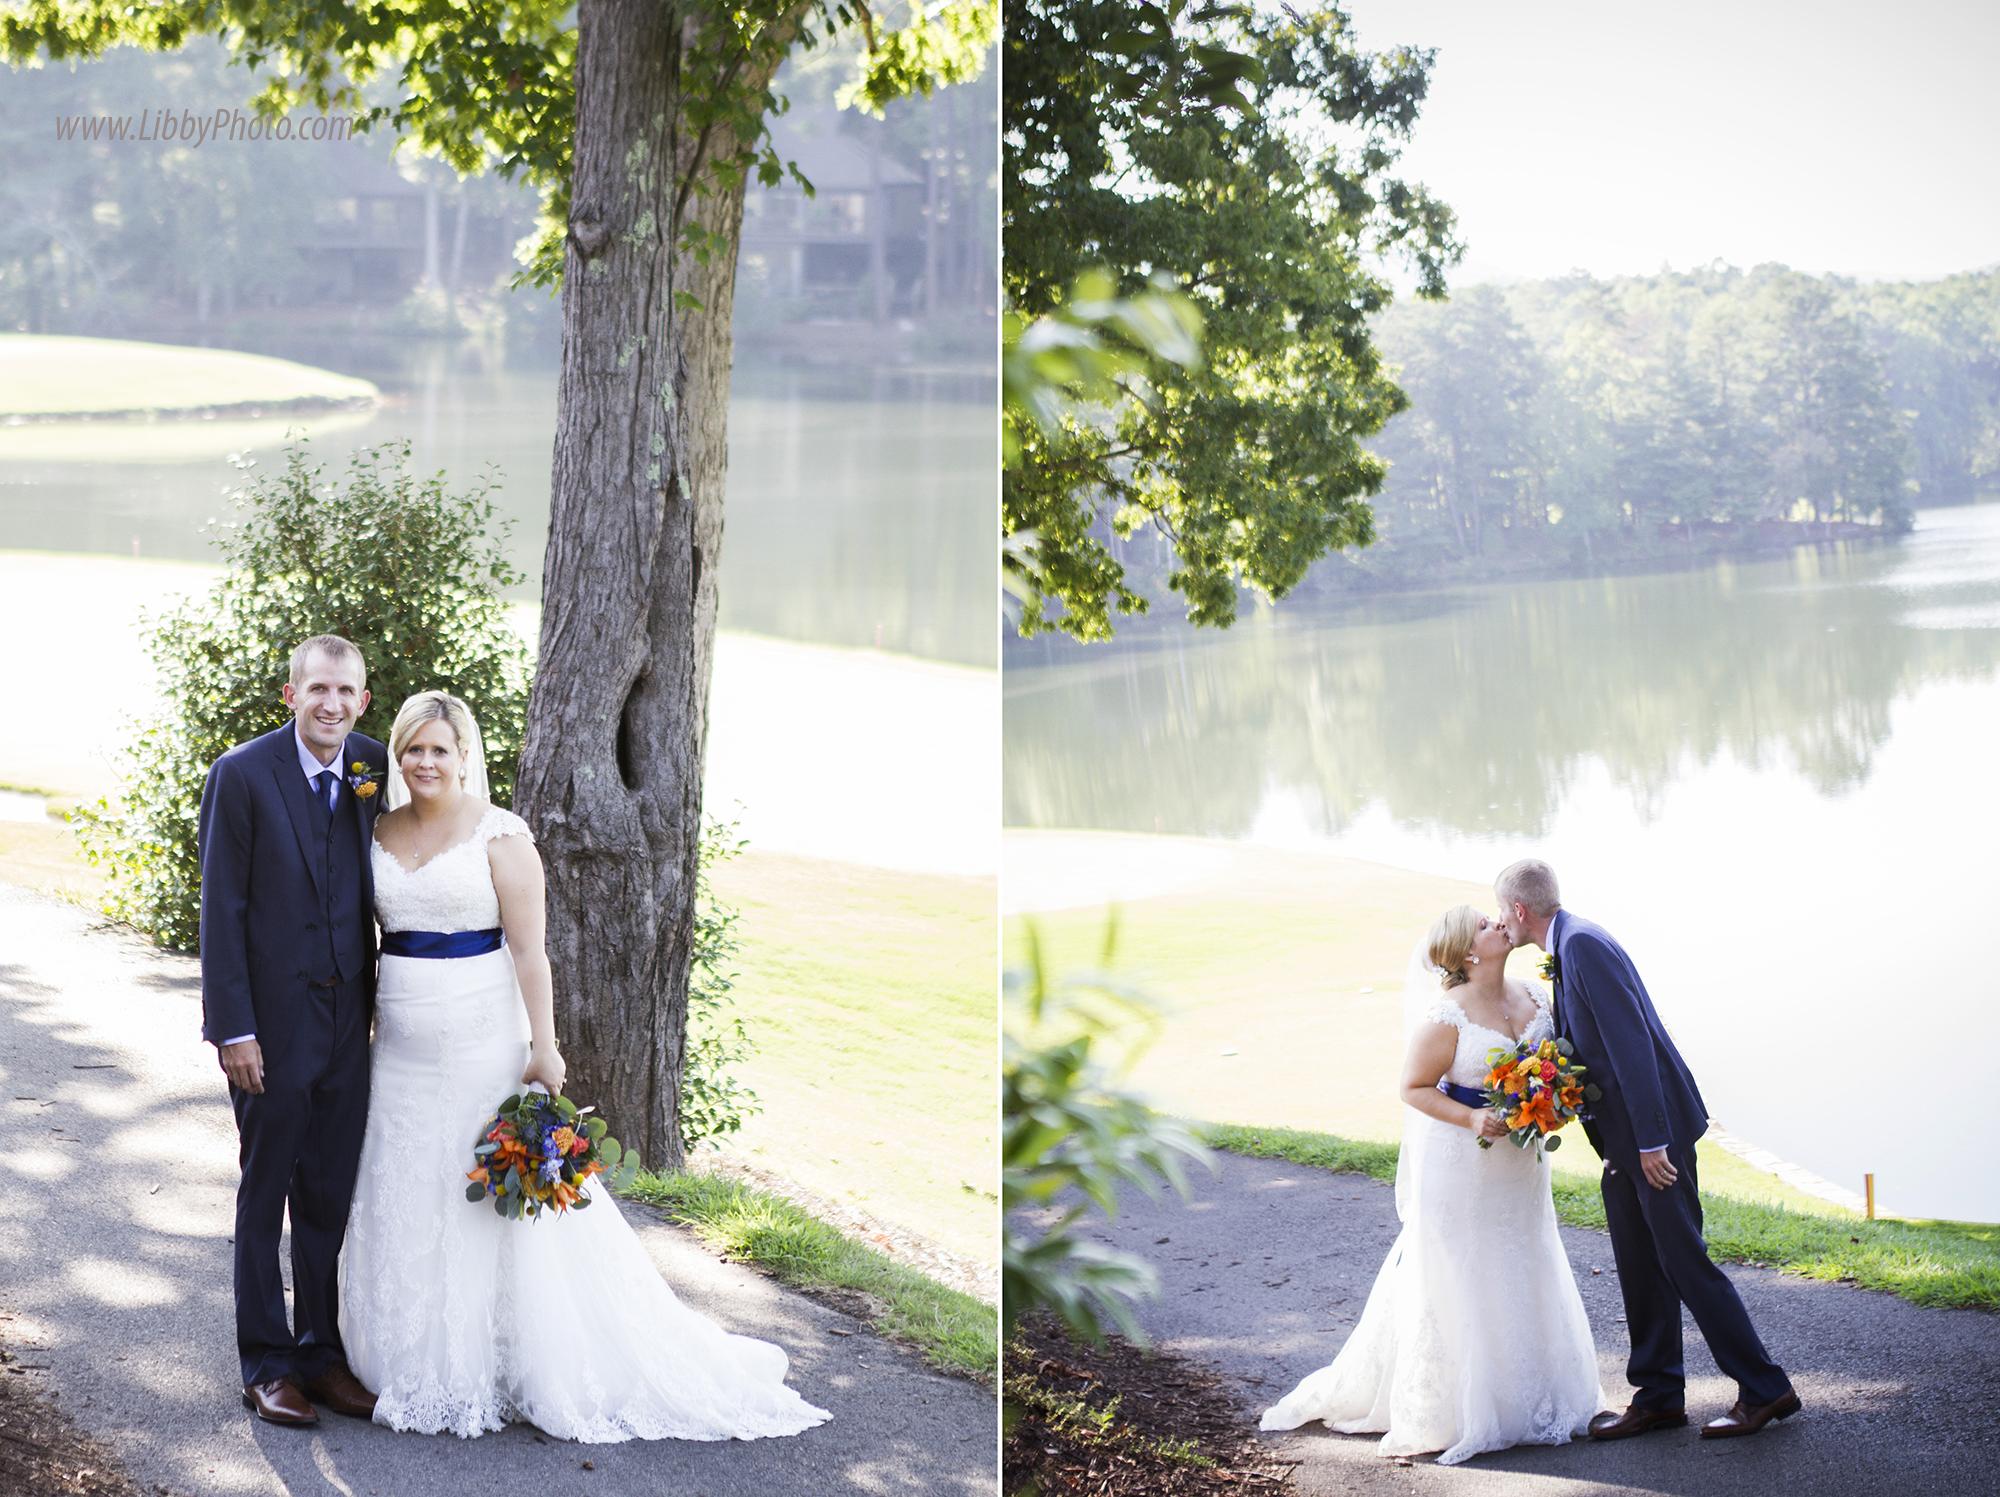 Atlanta wedding photography, Libbyphoto11 (29).jpg